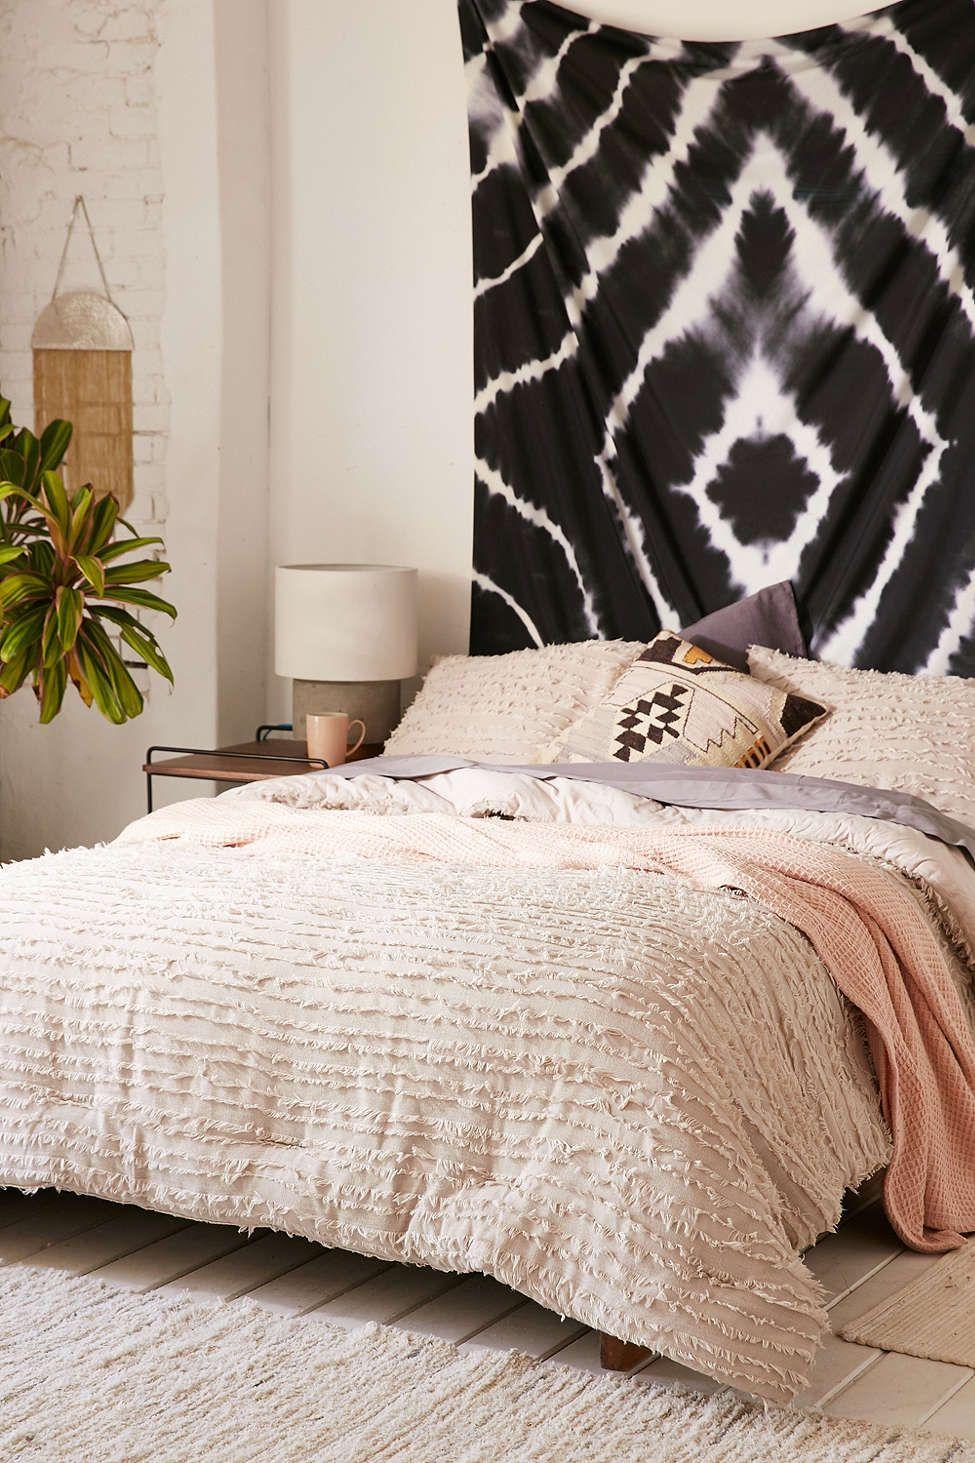 Eyelash Fringe Comforter Comforters, Tan comforter, Dorm